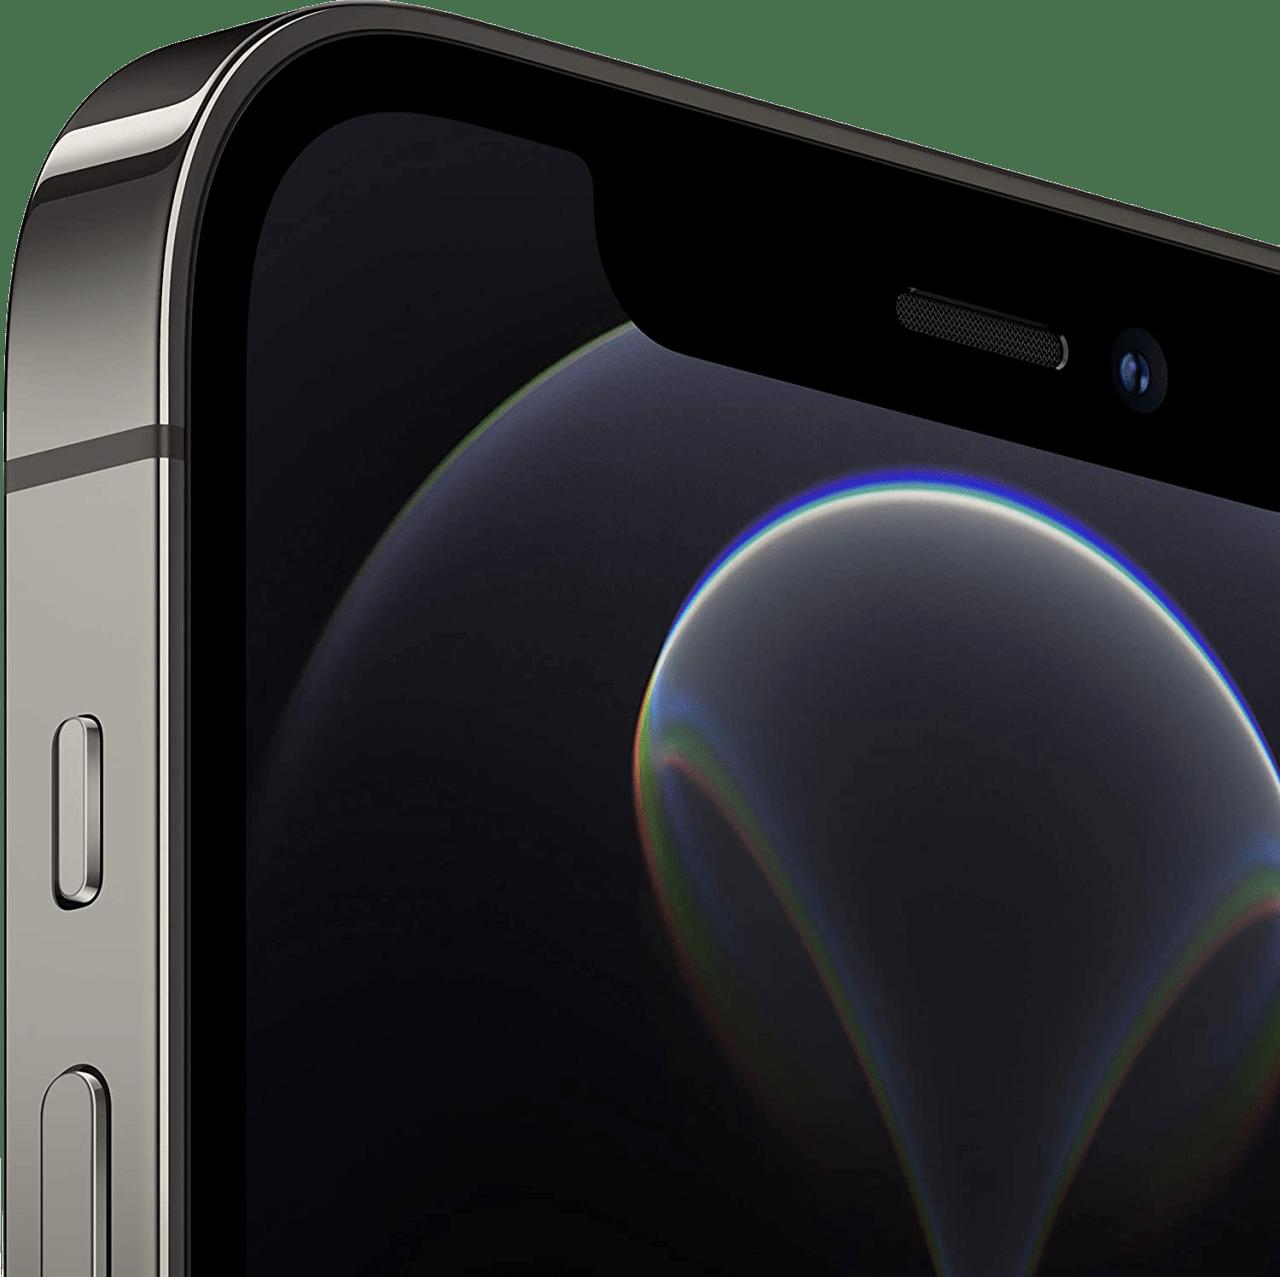 Grau Apple iPhone 12 Pro - 512GB - Dual Sim.4